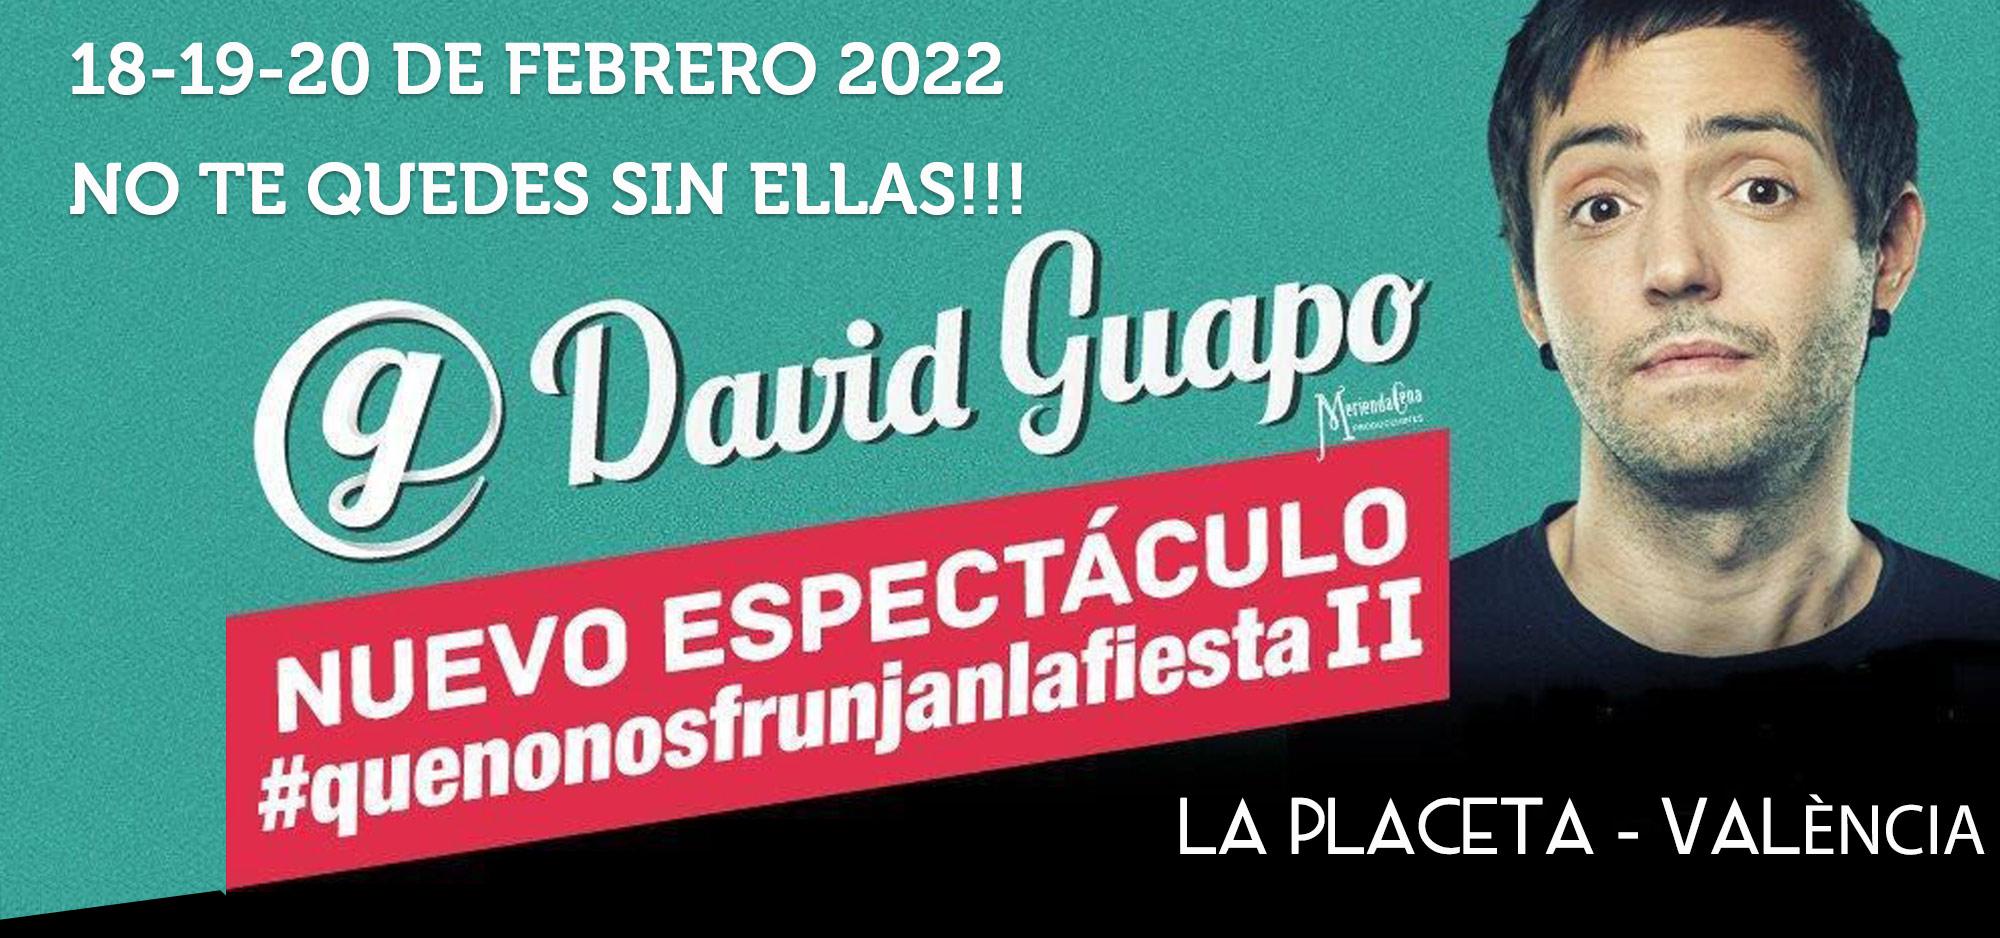 DAVID GUAPO 2.0